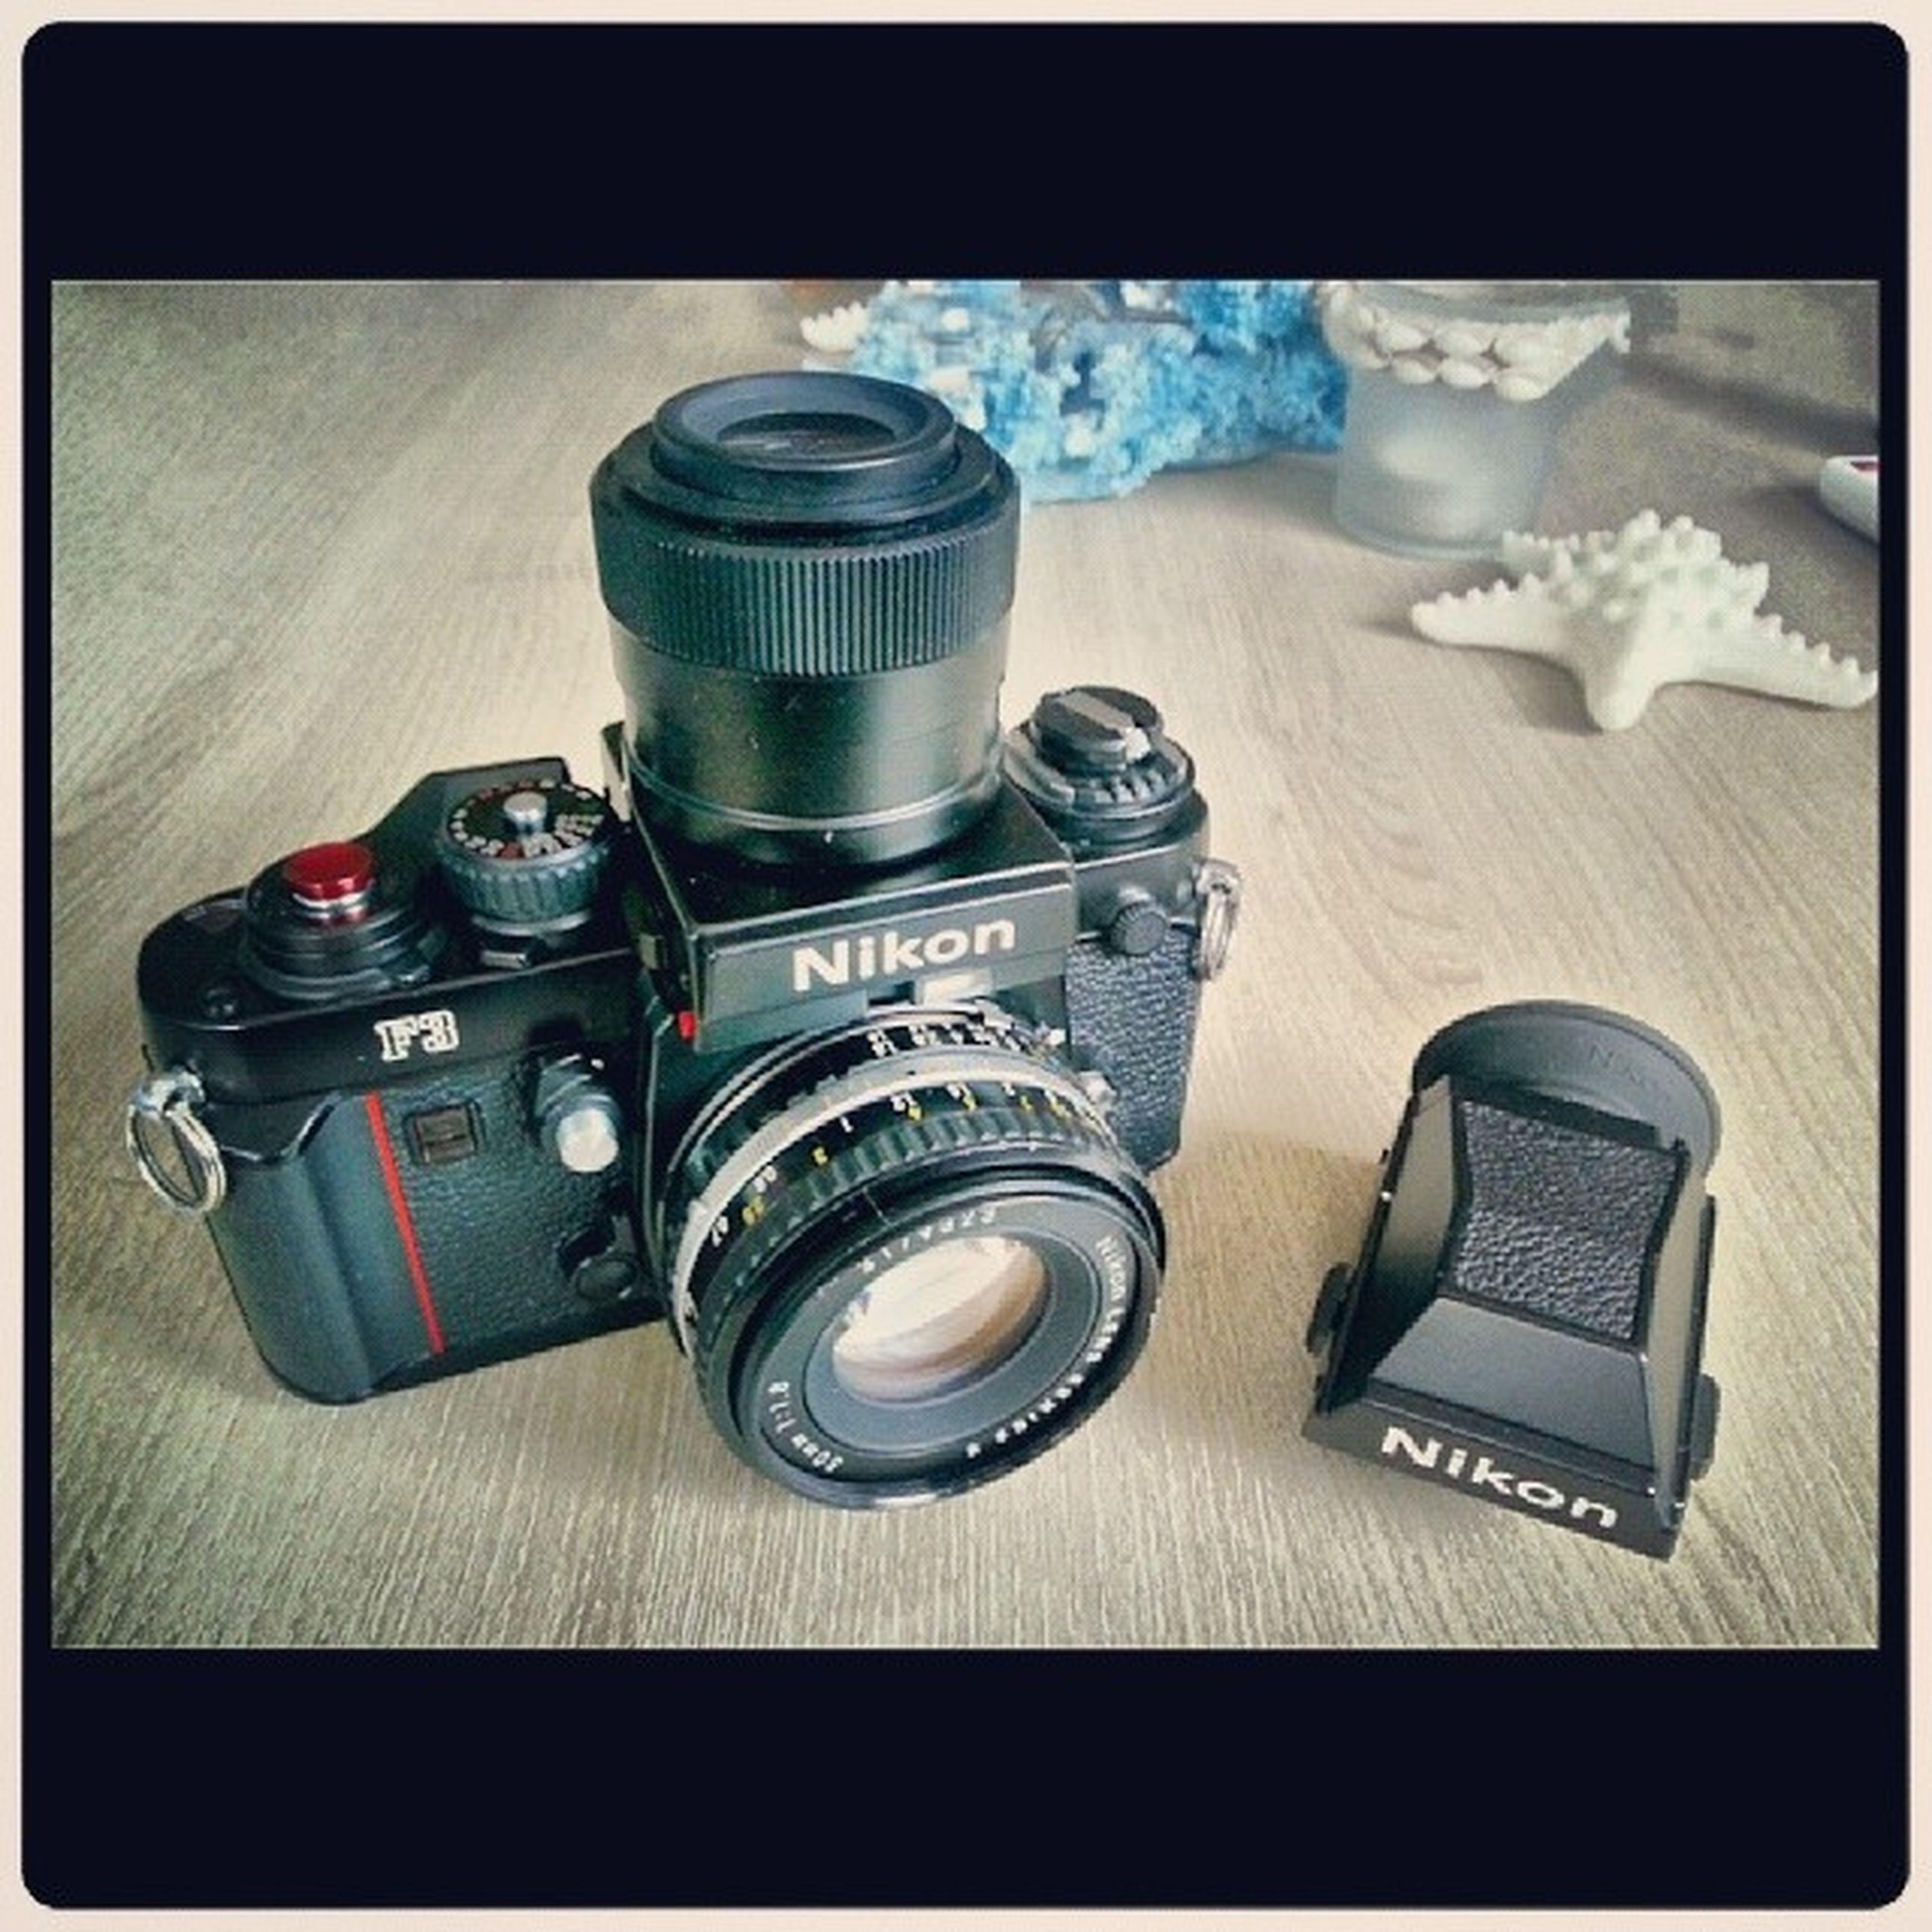 Nikon Nikonf3 Nikonanalog Analog dw4 filmcamera filmisnotdead filmphotography nikkor 35mm style classic hdr 50mm bestofphotos instalike instamoment instadaily instabeautiful l4l likealways likeall likebackteam f3